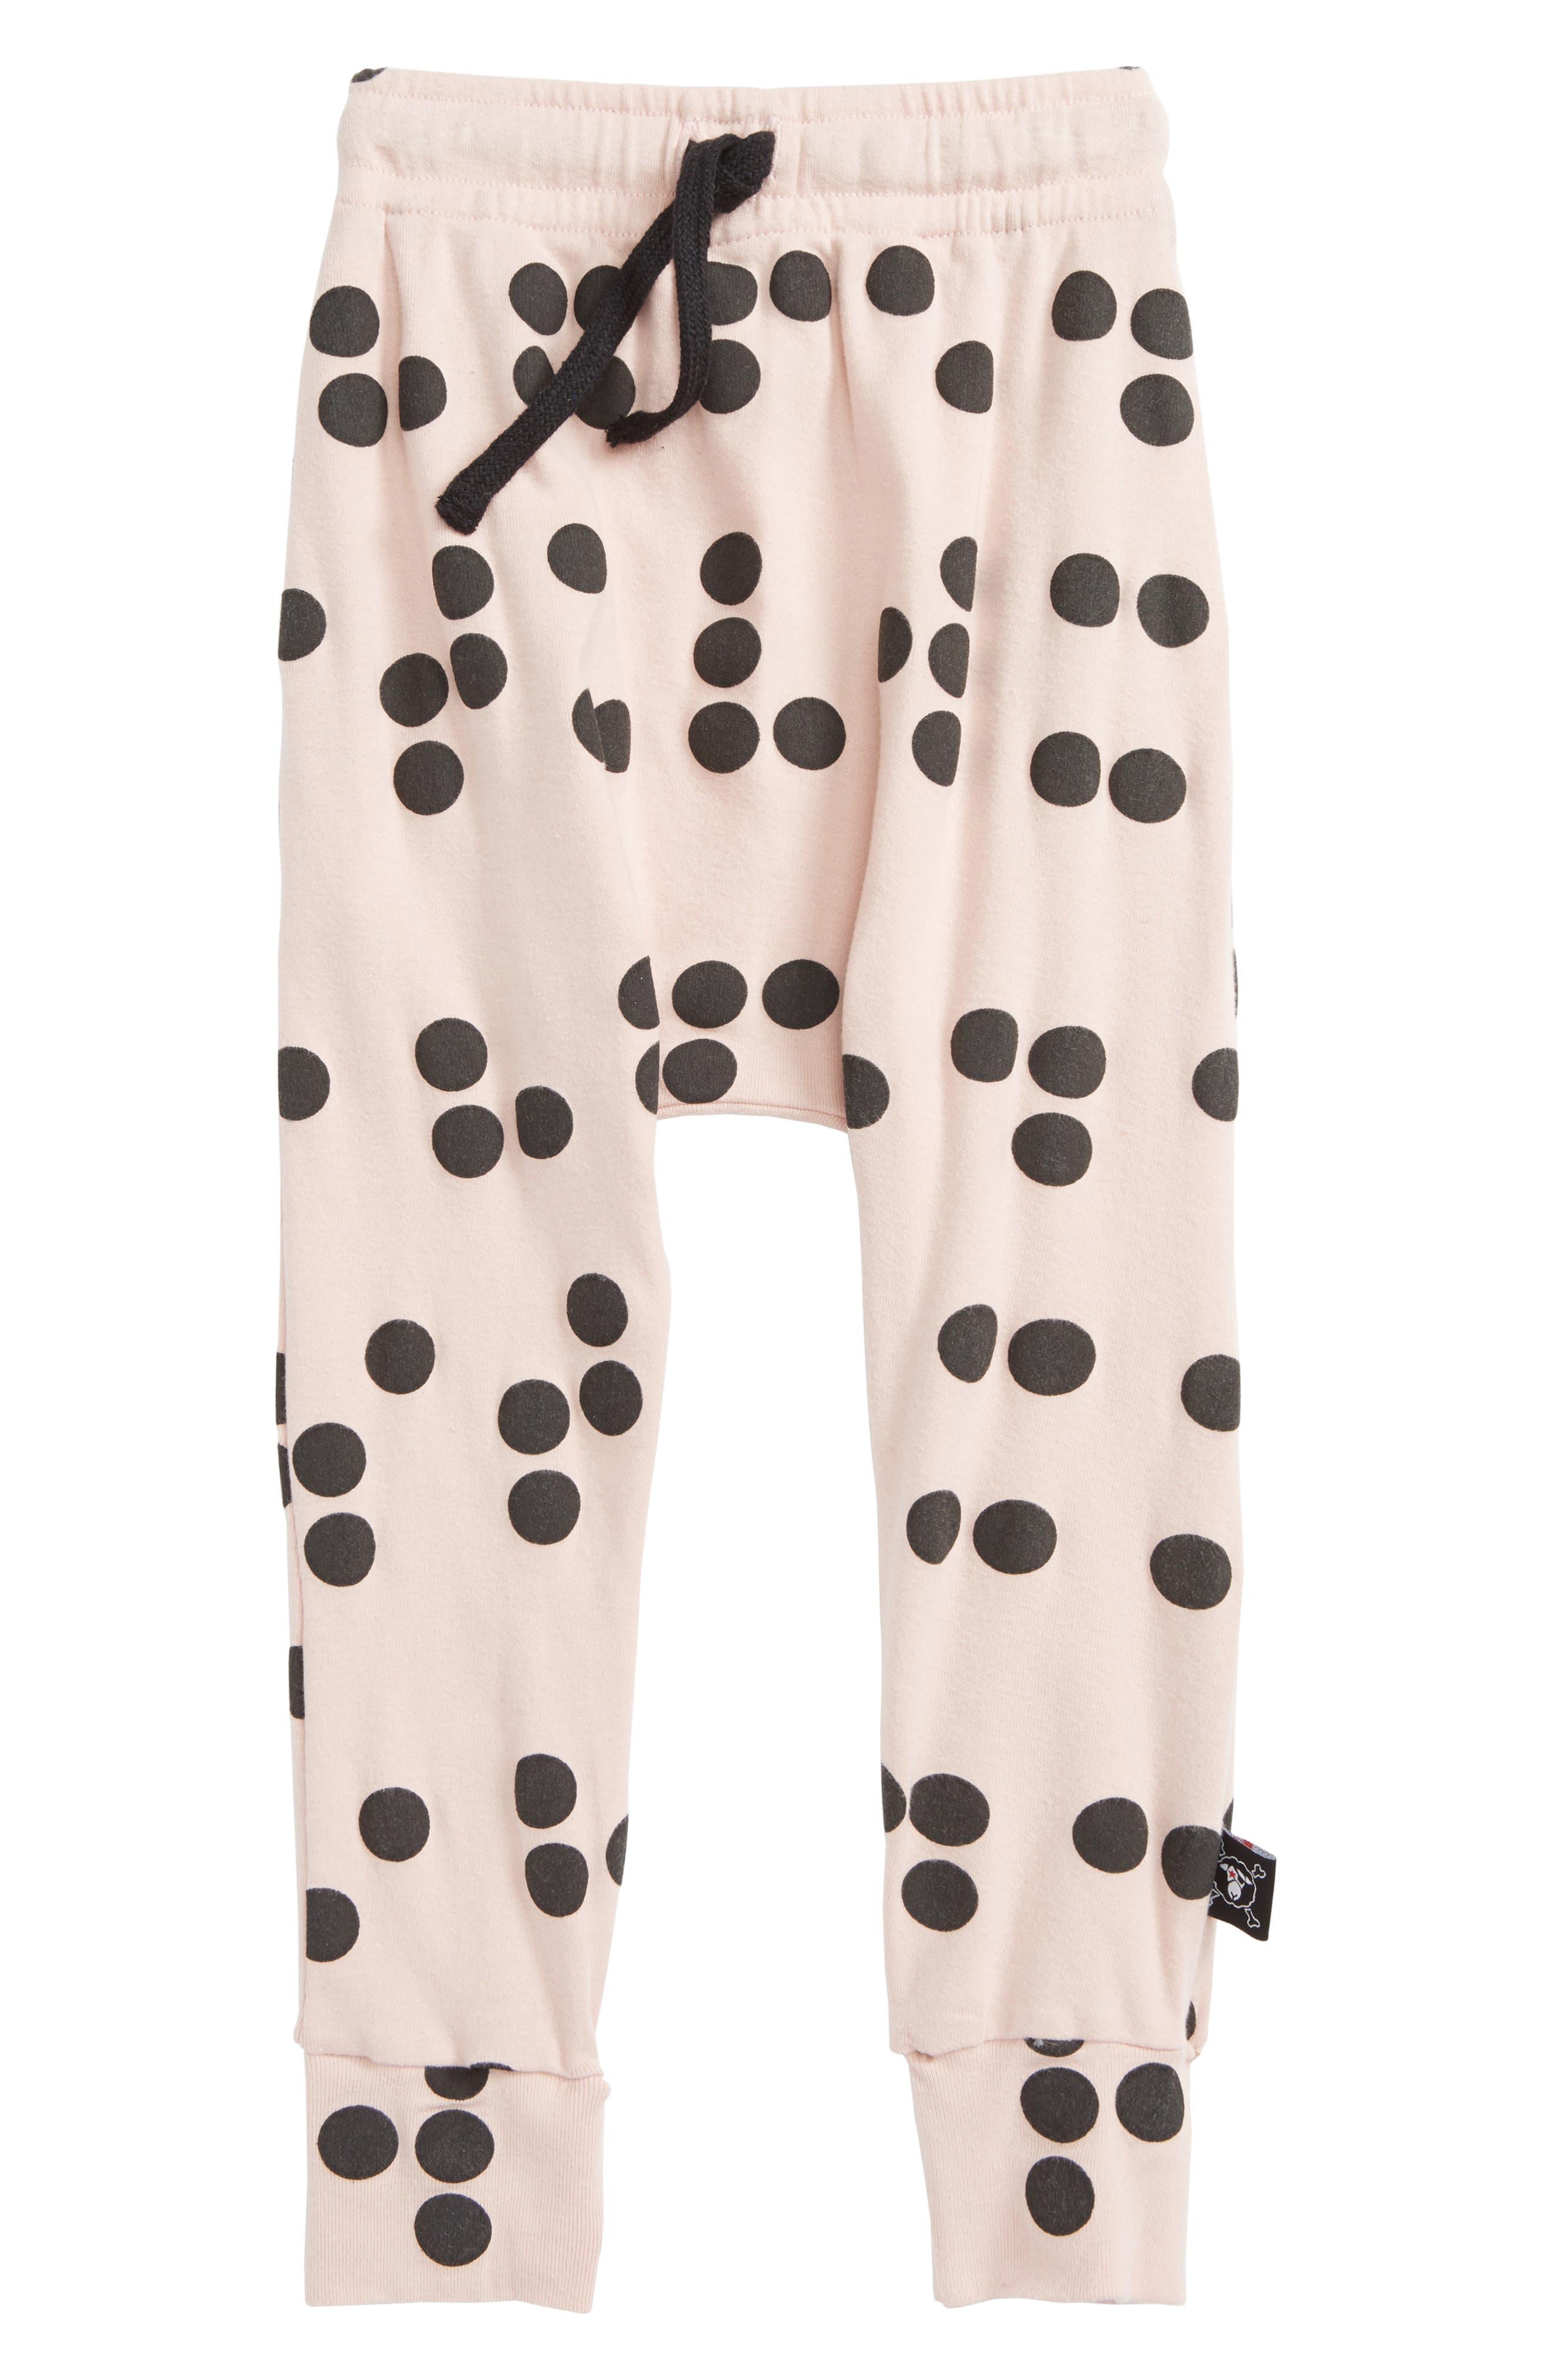 Braille Baggy Pants,                             Main thumbnail 1, color,                             Powder Pink